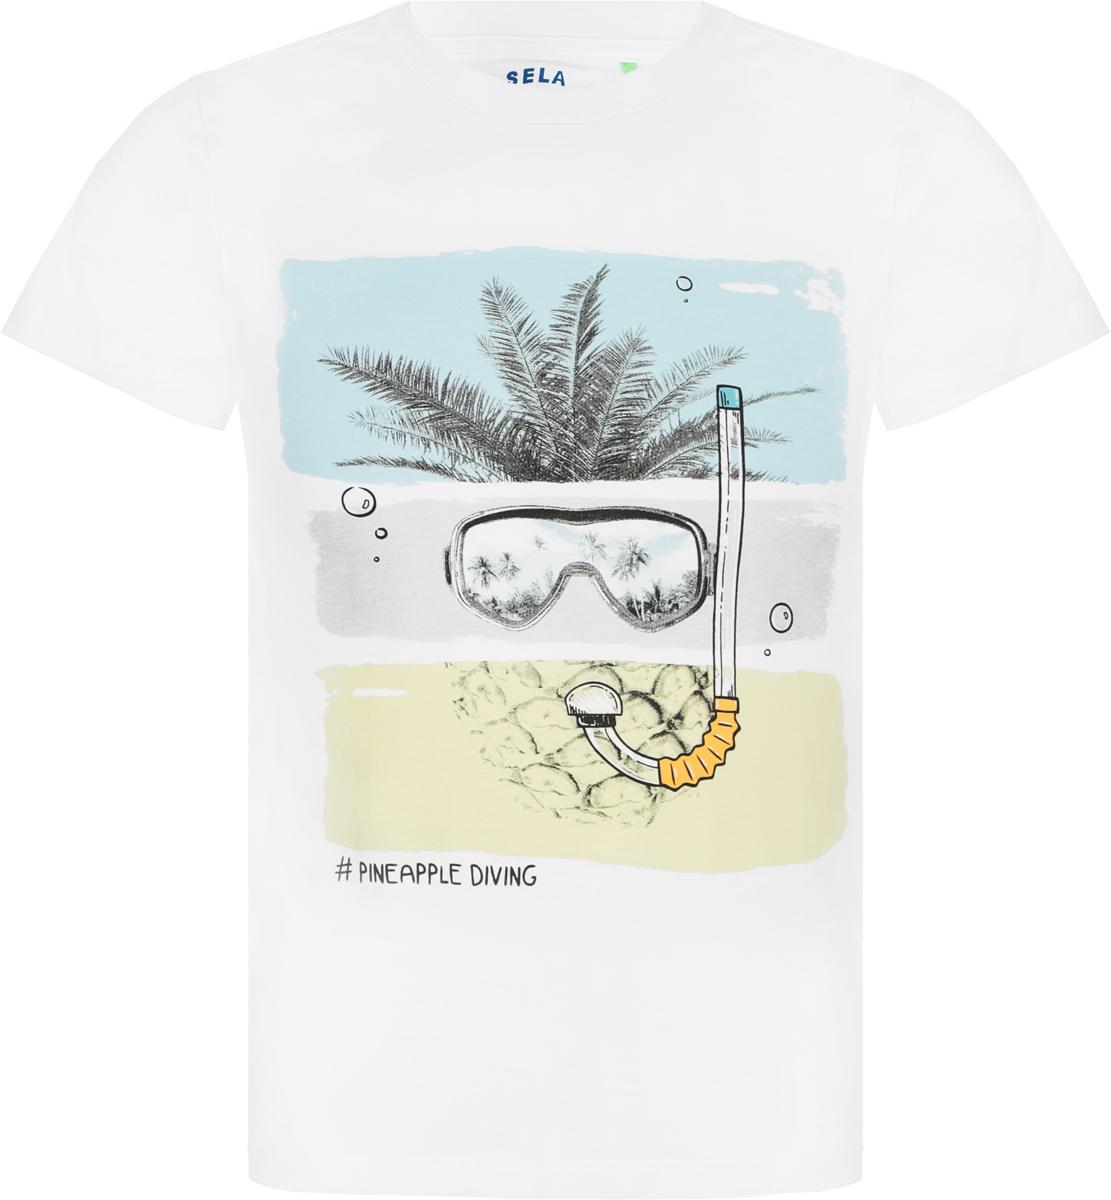 Футболка для мальчика Sela, цвет: белый. Ts-711/566-8234. Размер 116, 6 лет футболка для мальчика sela цвет белый ts 711 567 8234 размер 116 6 лет